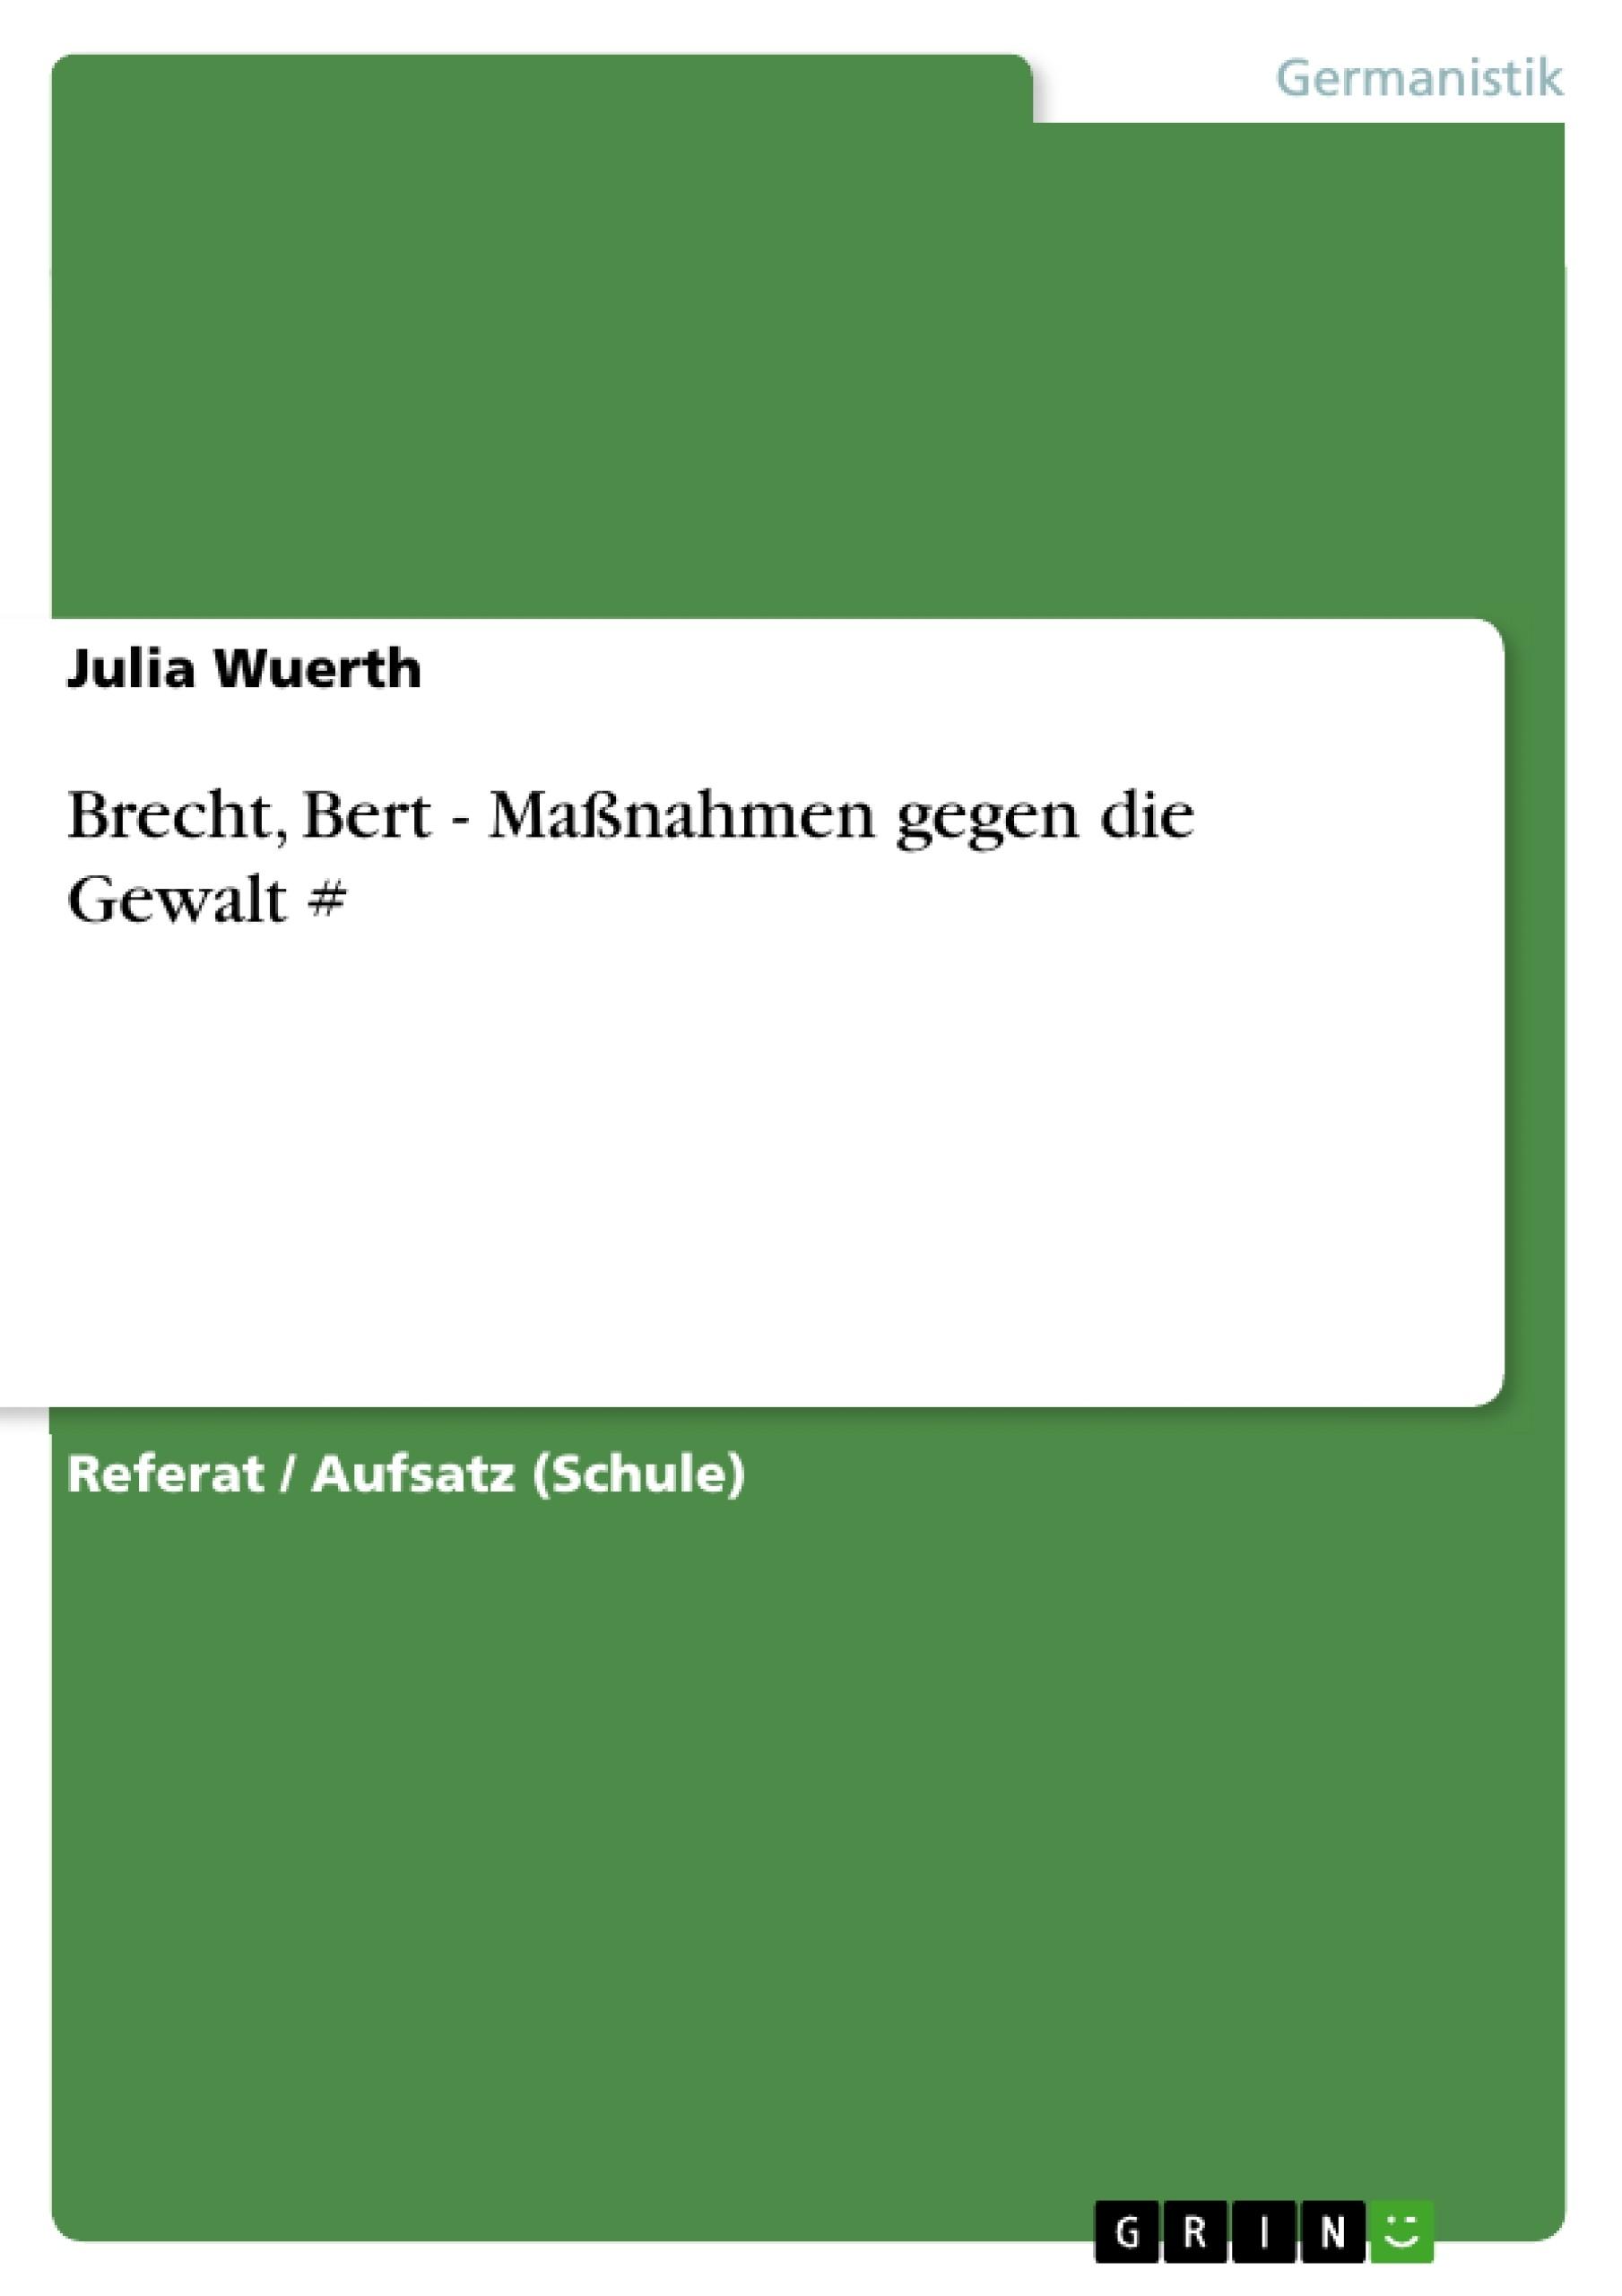 Titel: Brecht, Bert - Maßnahmen gegen die Gewalt #